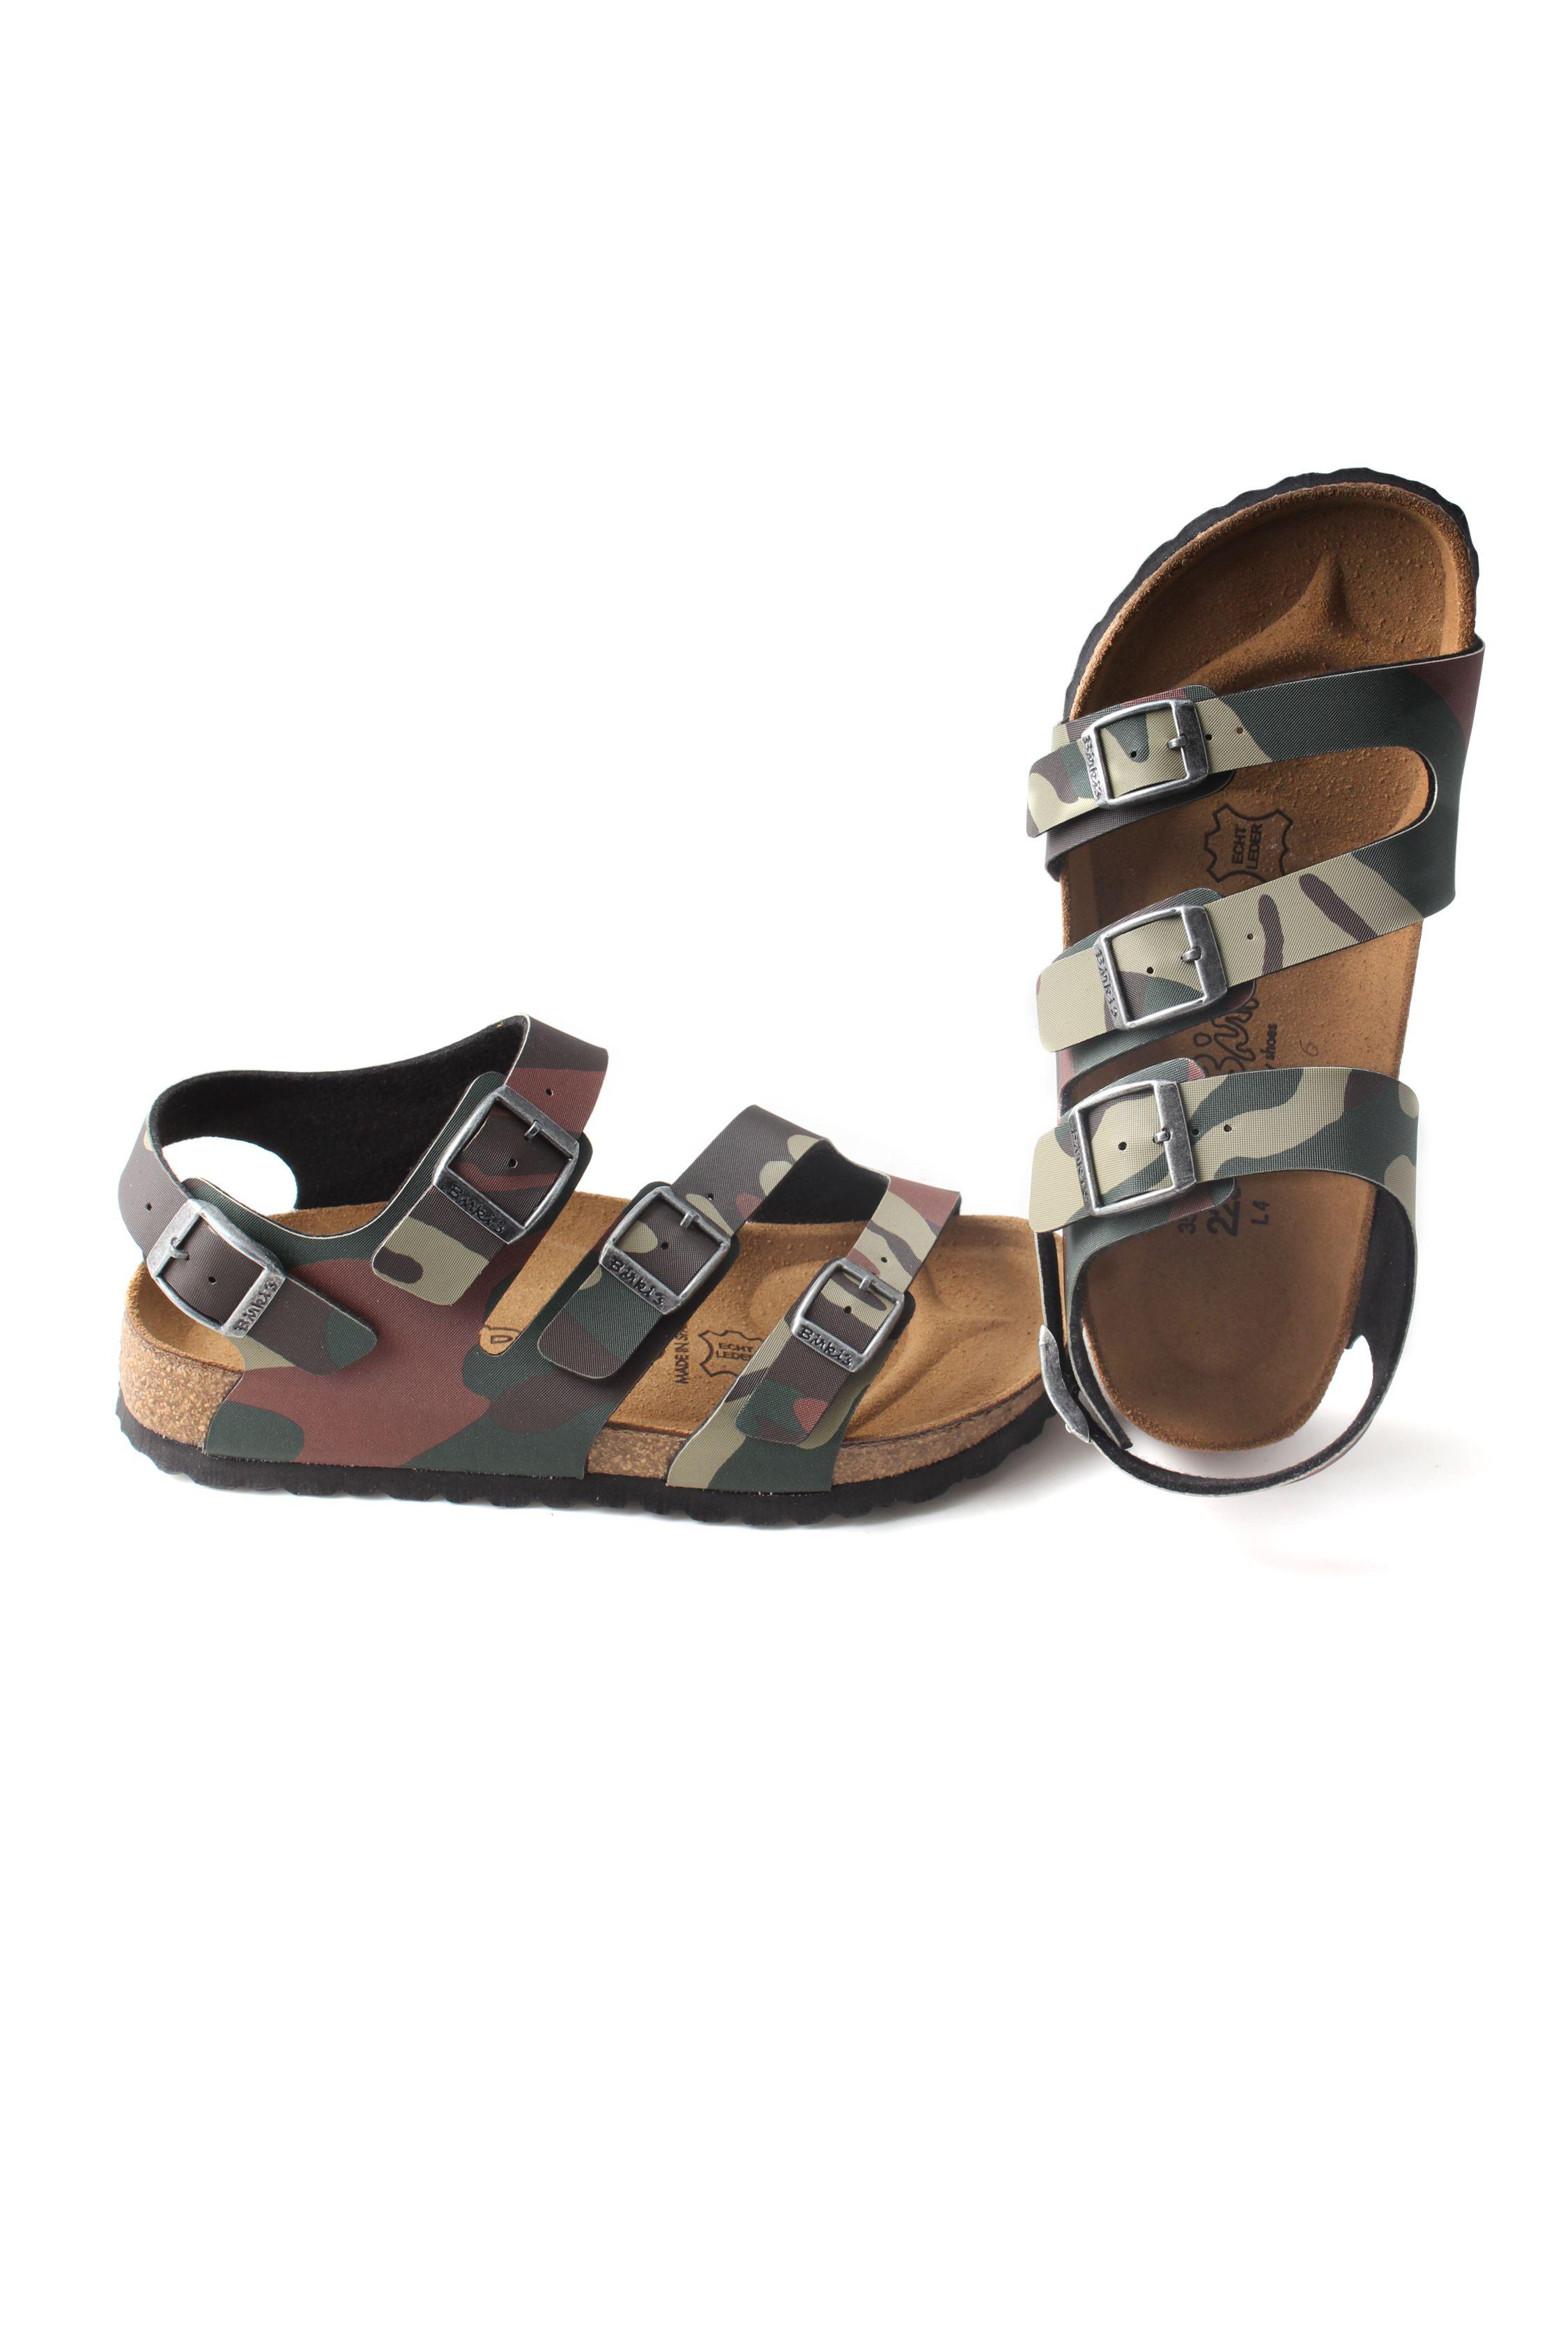 ec8b0bb6d2257 Birkenstock bambino Ellice sandalo Militare 4 fibbie